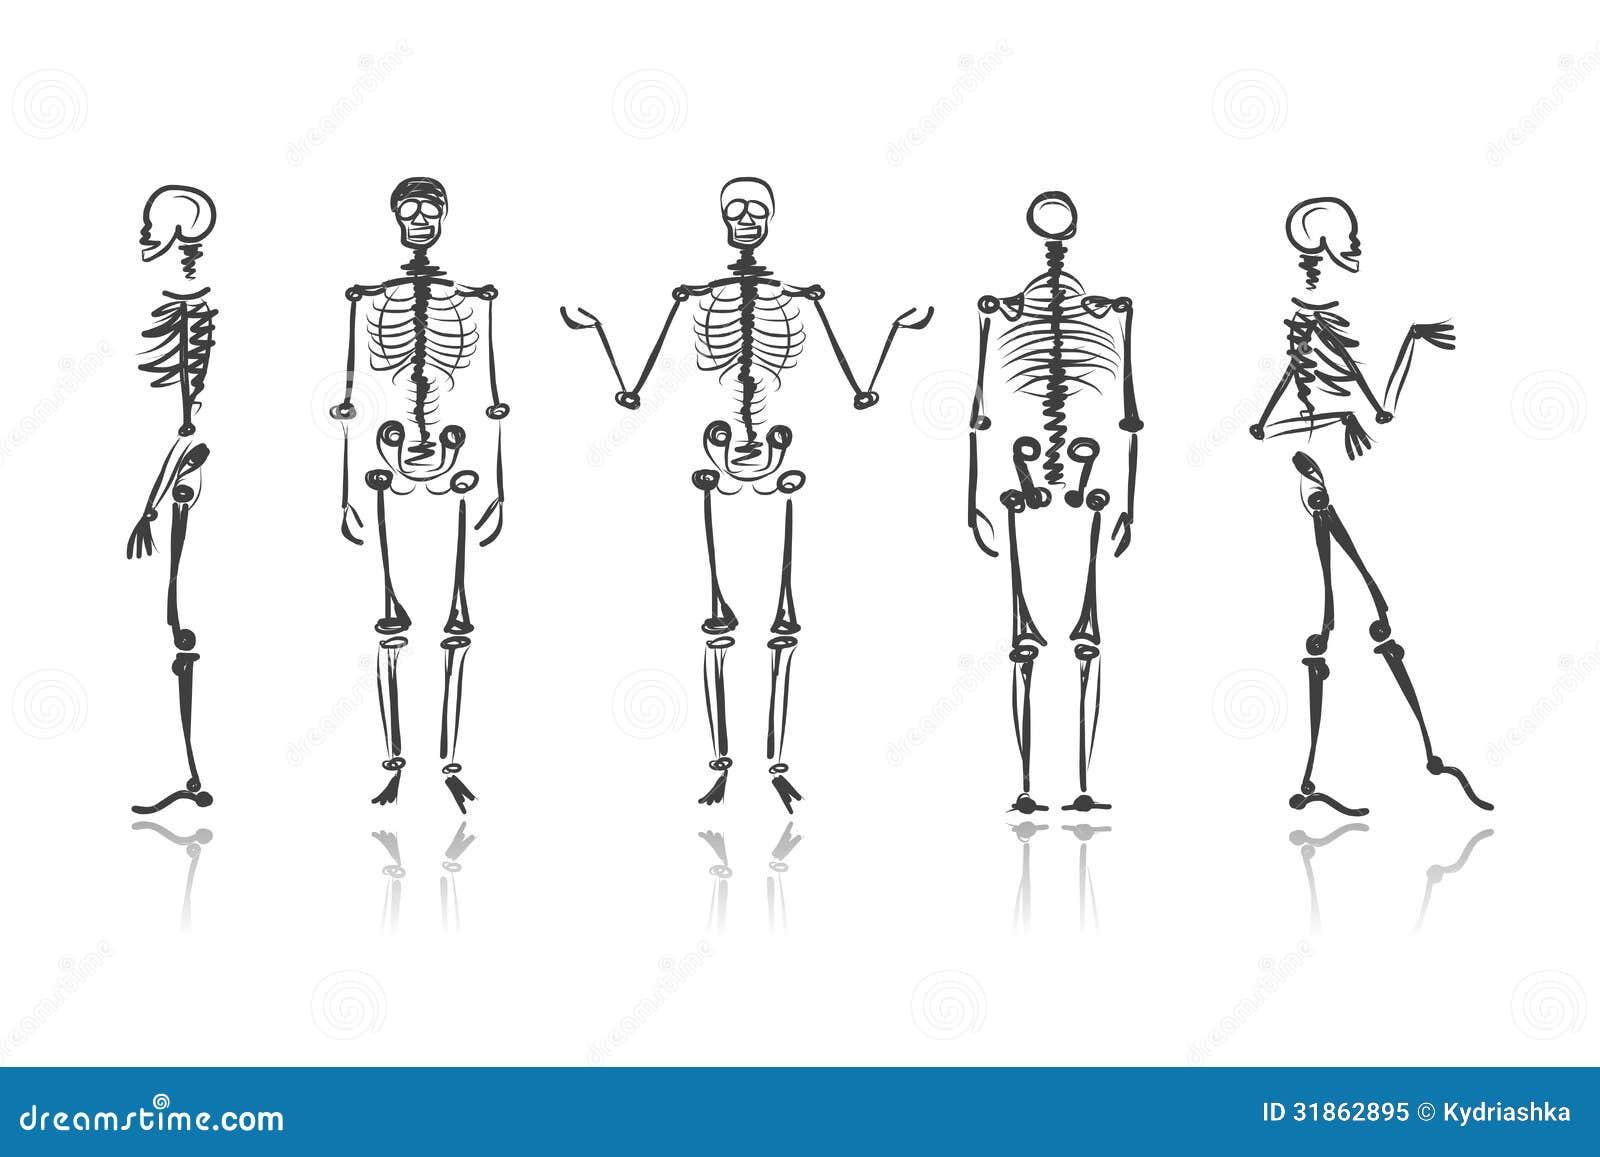 Vintage Anatomical Drawing Skeleton Sketches For ...